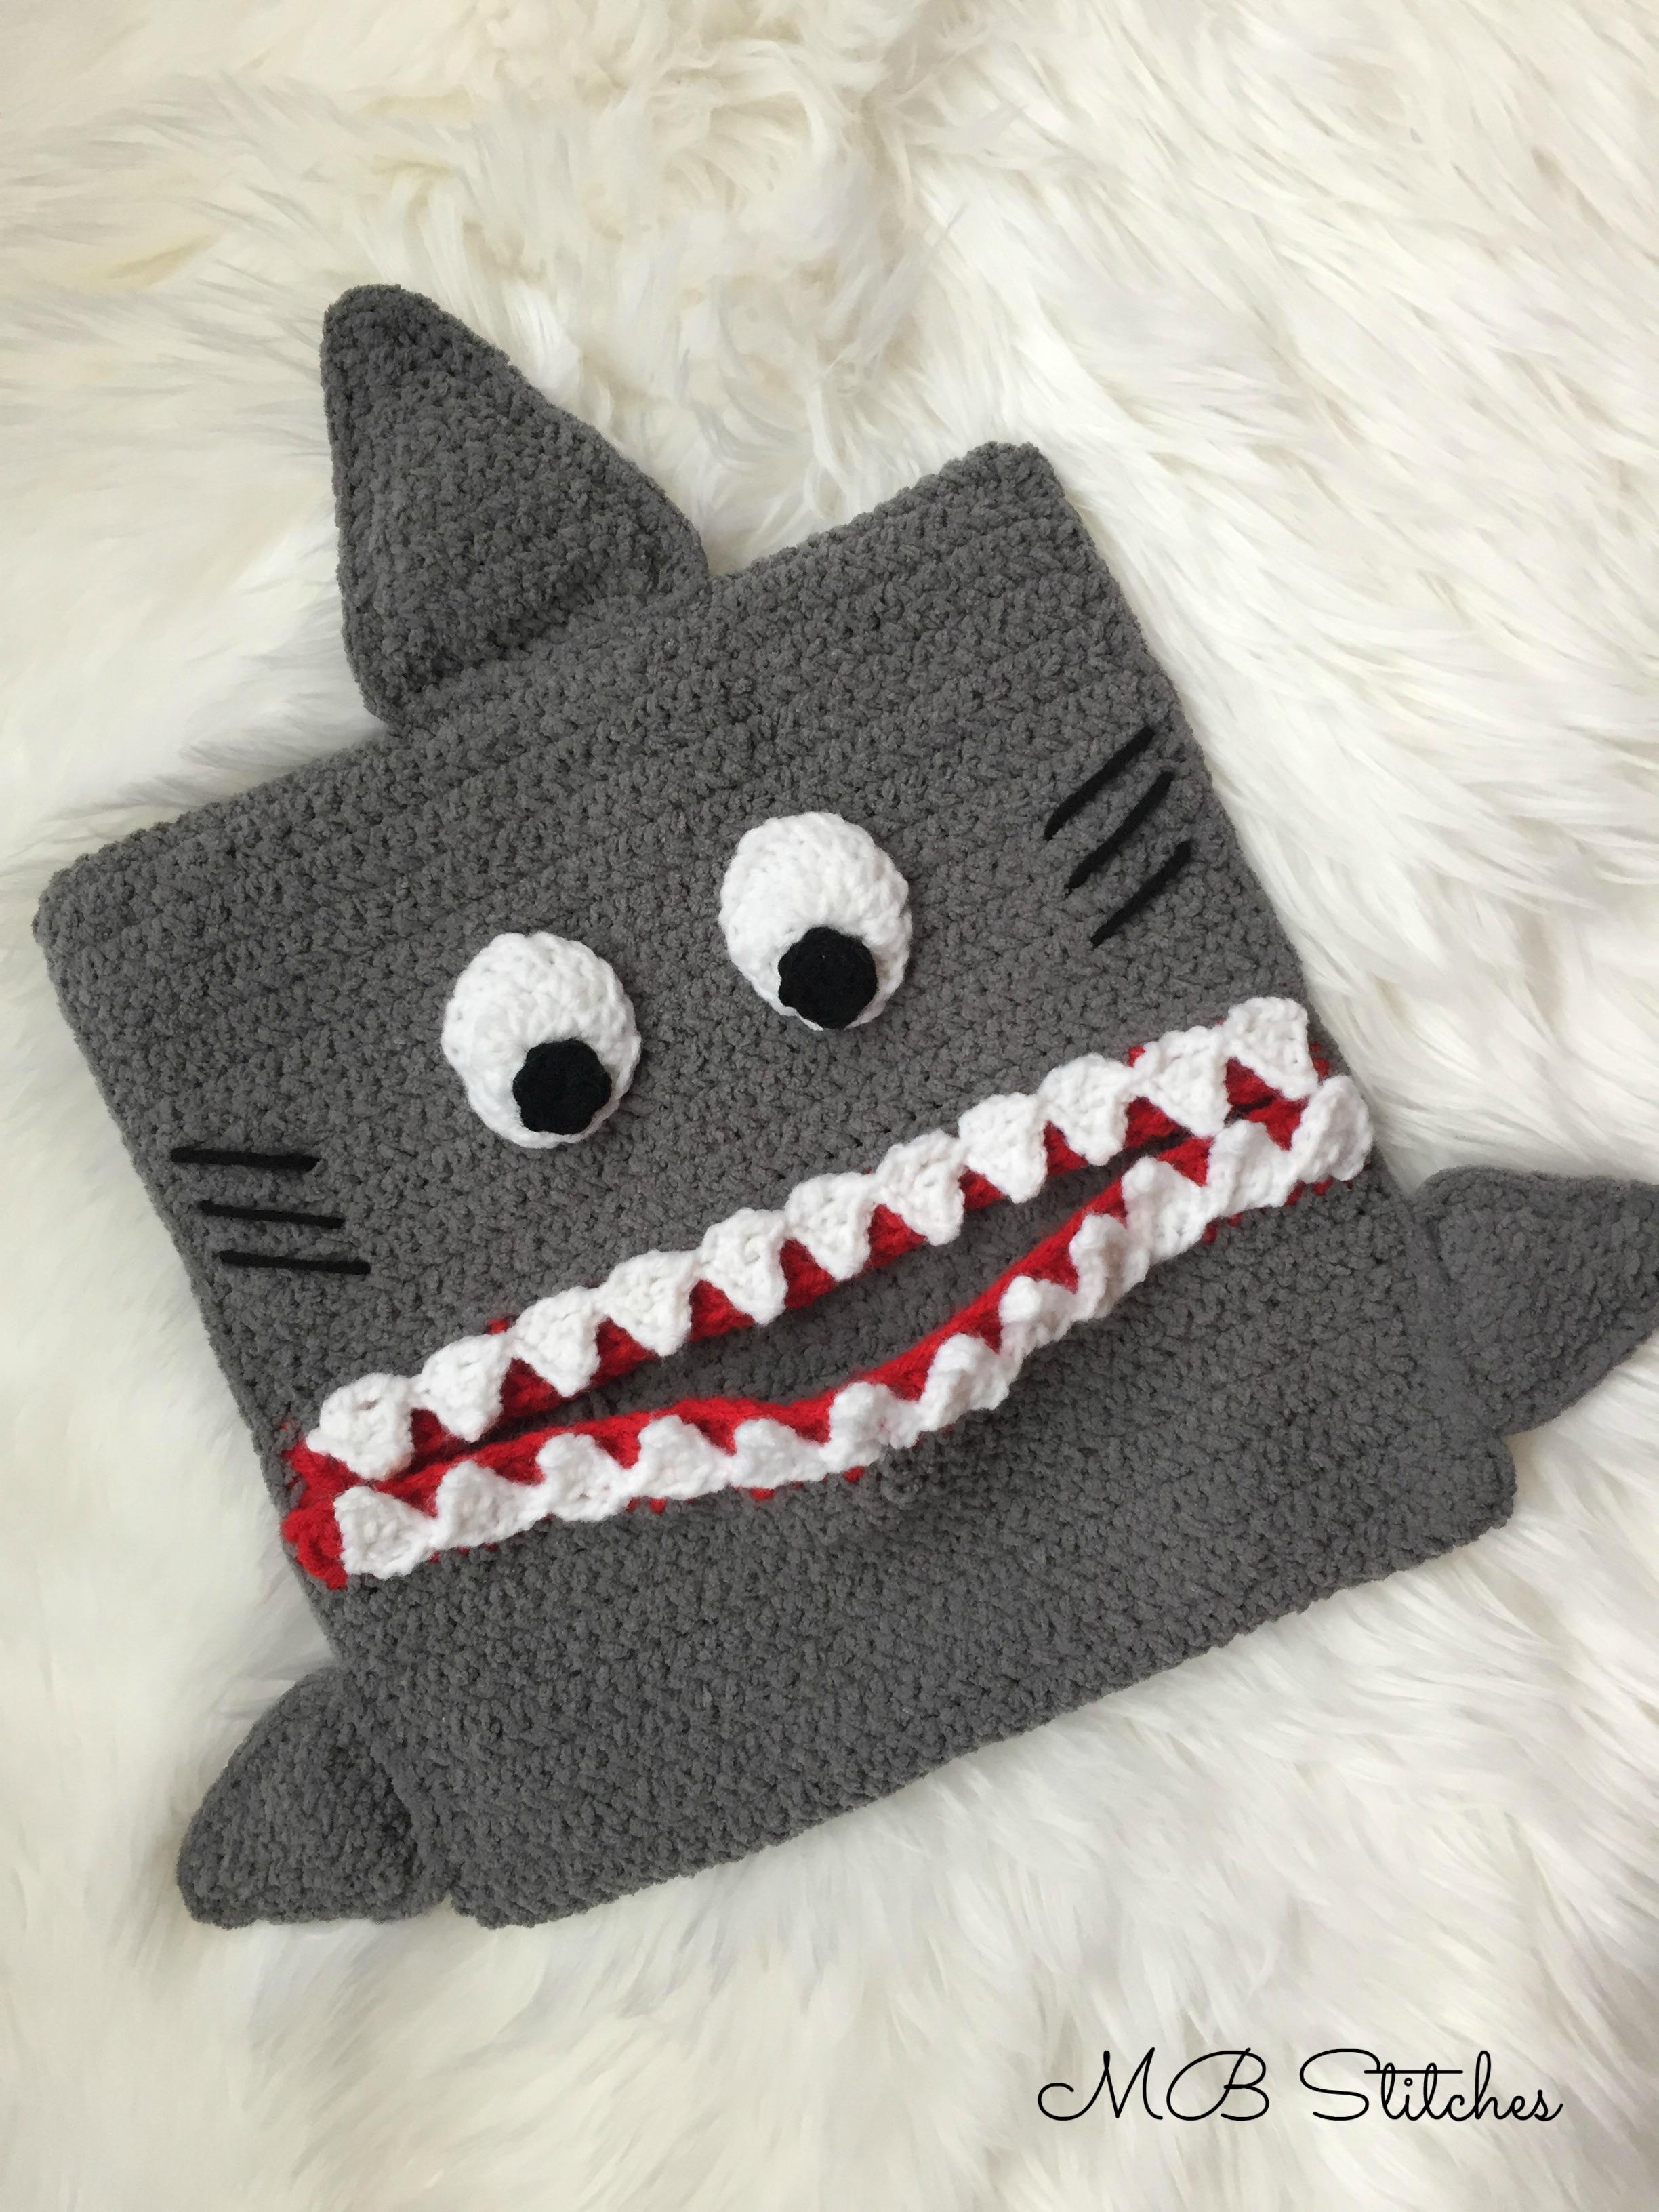 Crochet Shark Pajama Eater Pillow Mb Stitches